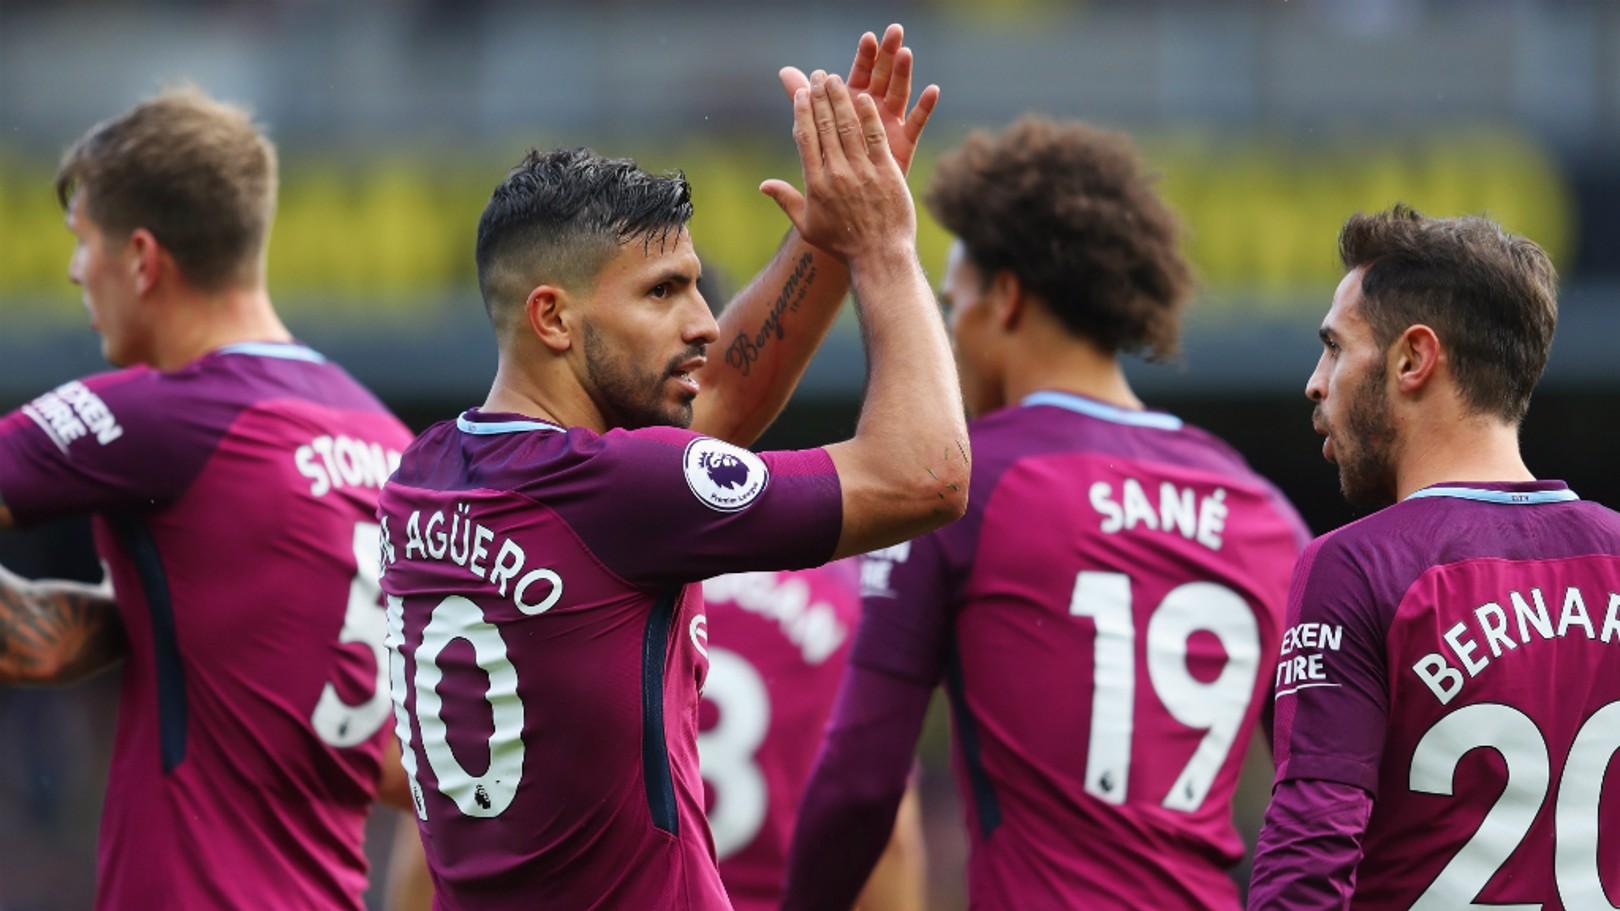 DEVASTATING DISPLAY: Sergio Aguero bagged a hat-trick at Watford